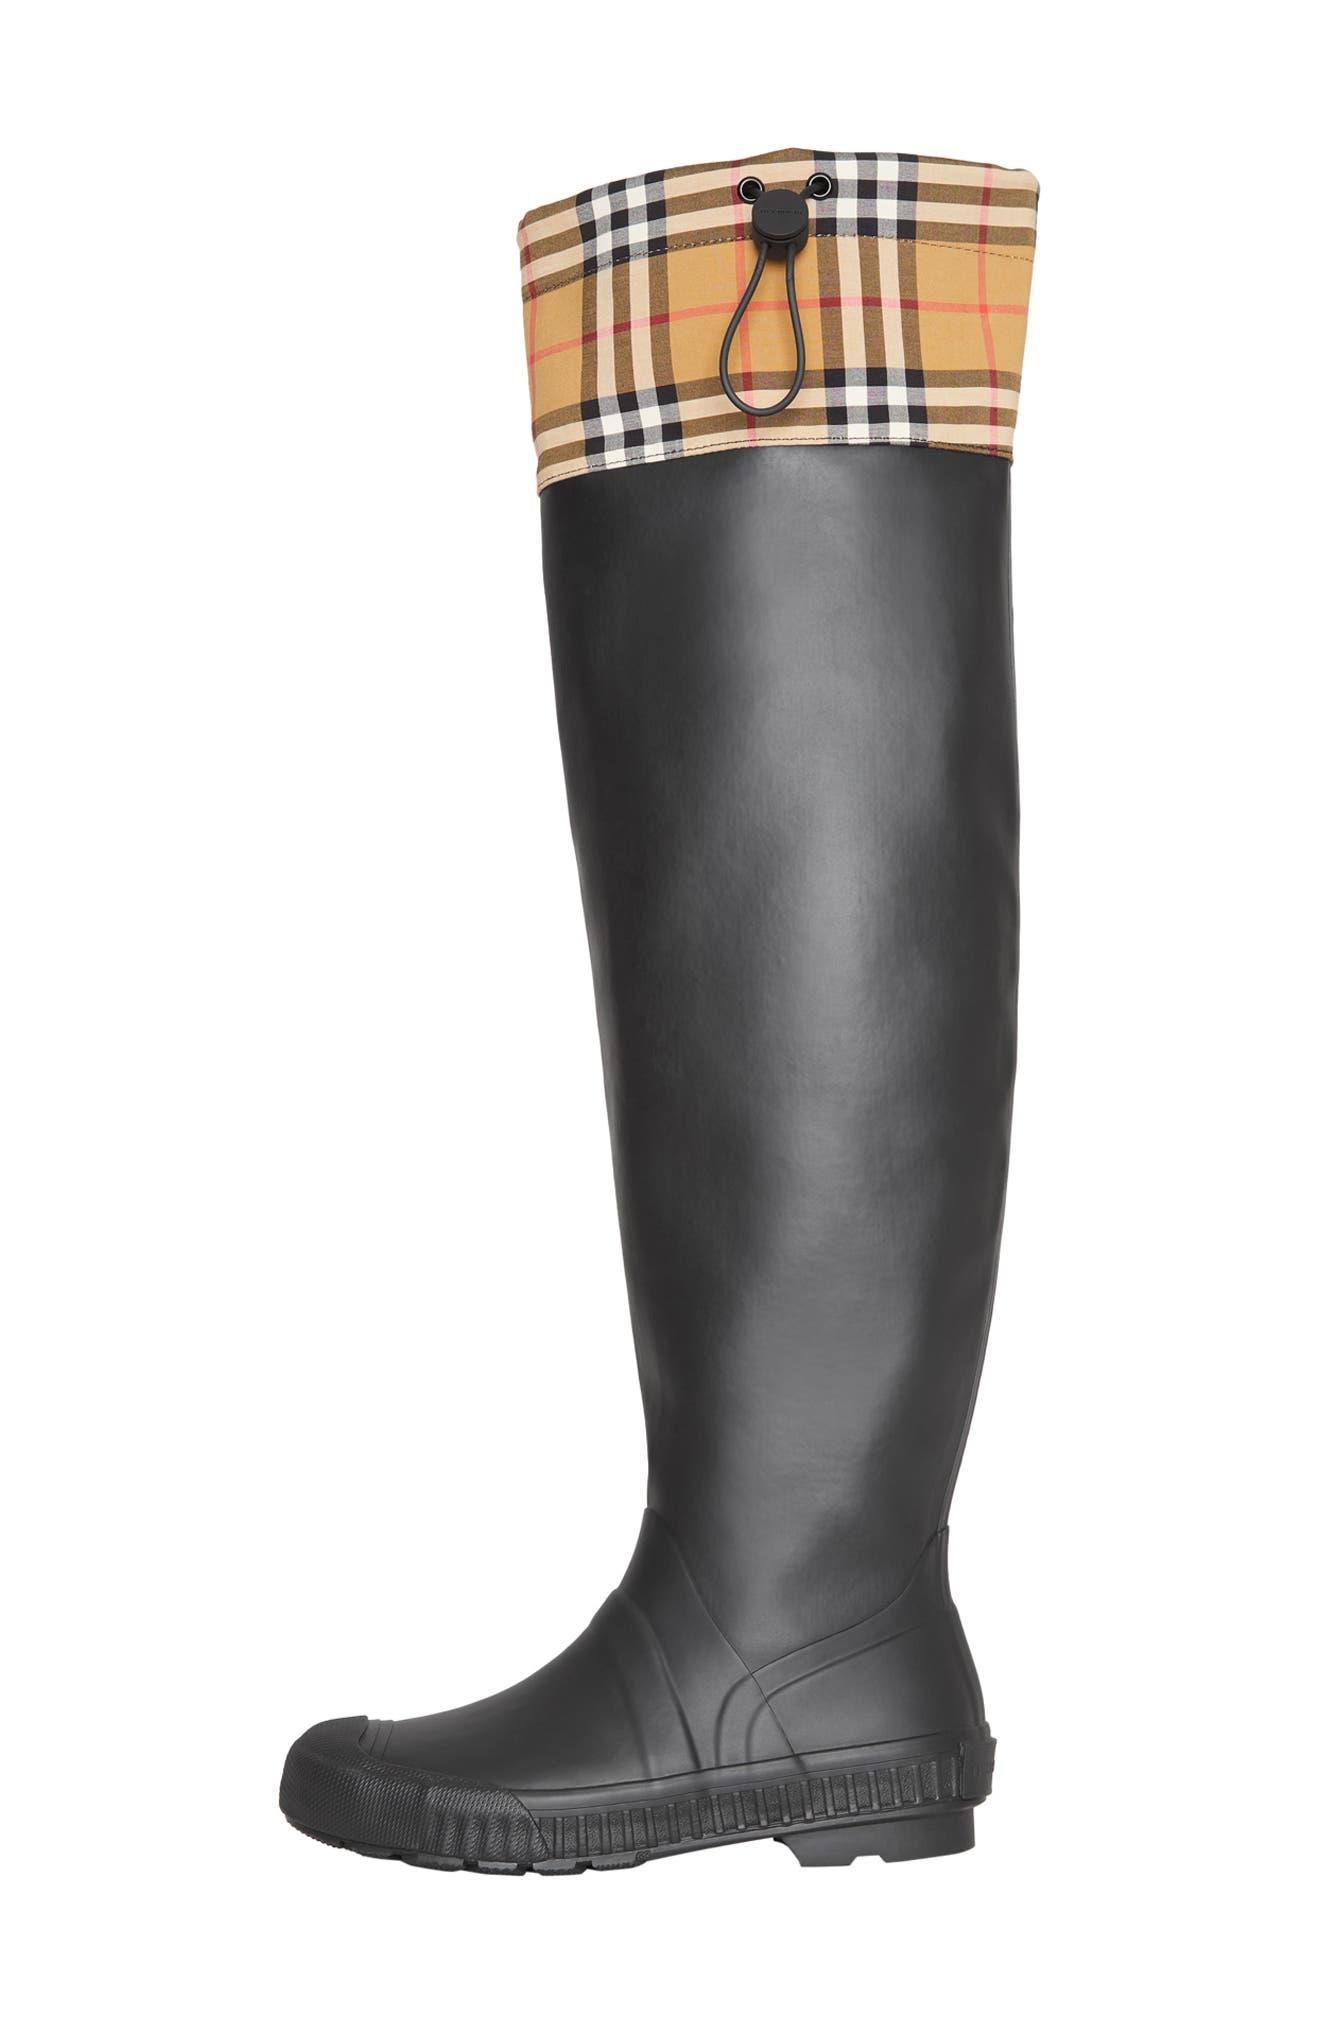 BURBERRY,                             Freddie Tall Waterproof Rain Boot,                             Alternate thumbnail 7, color,                             BLACK